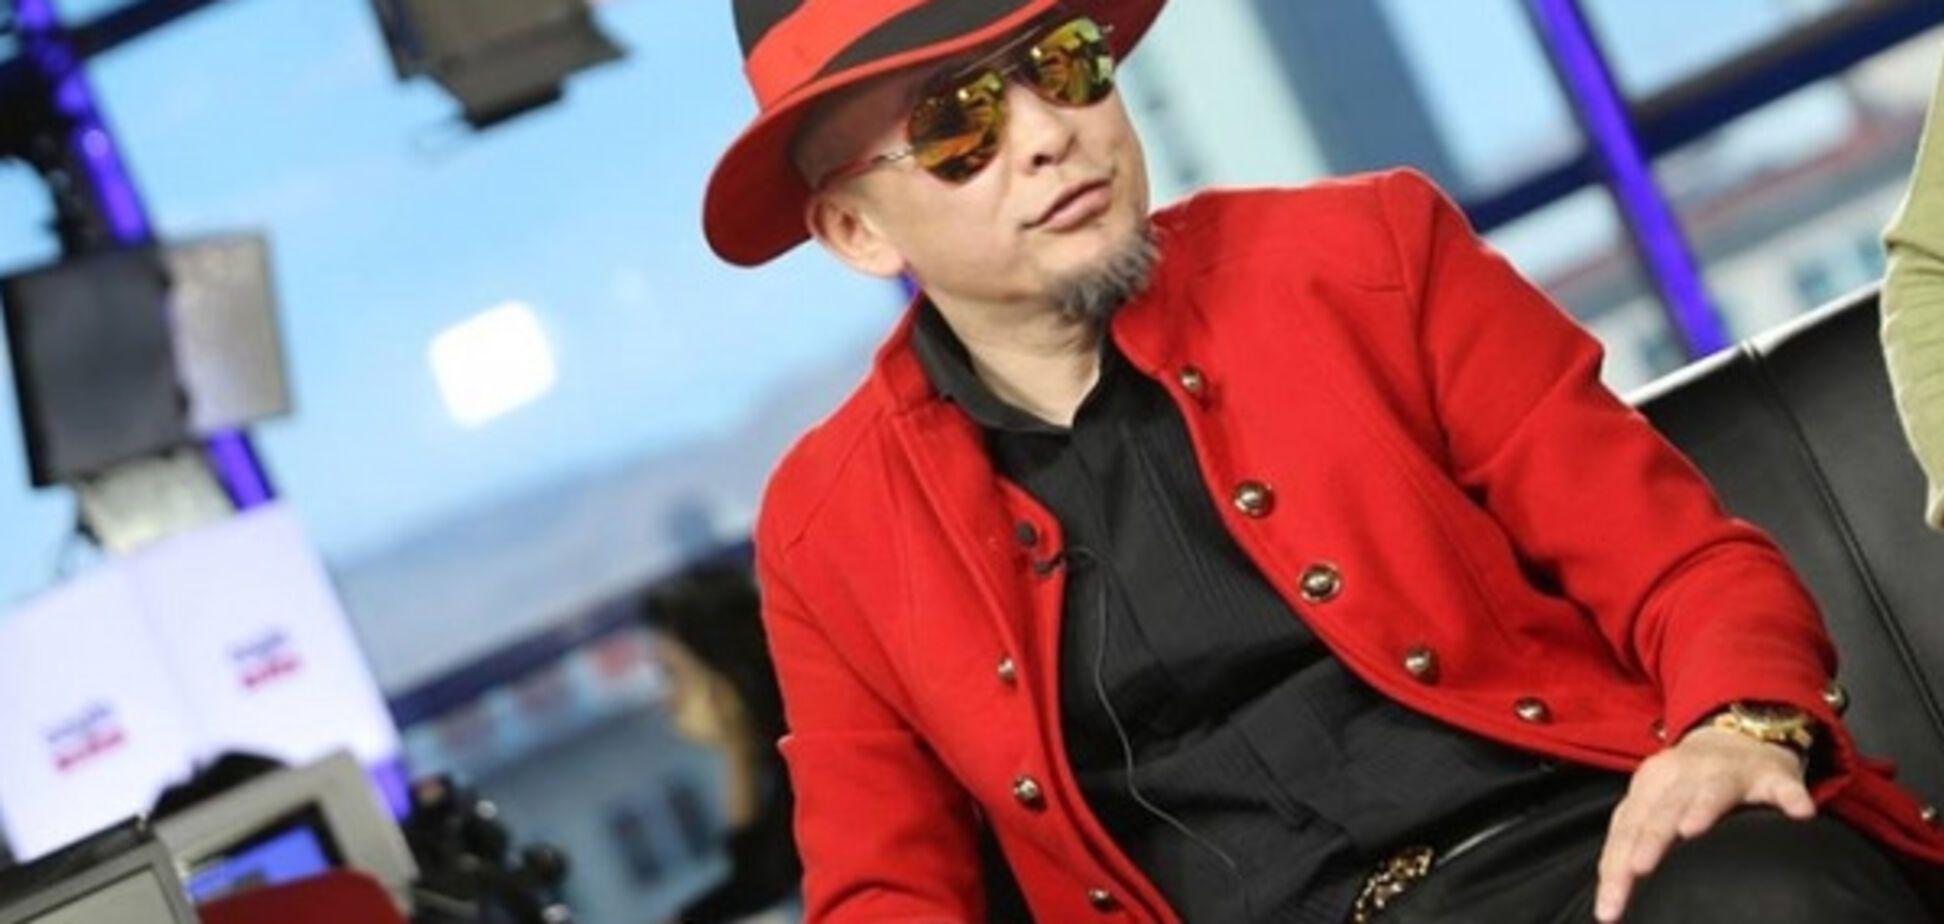 Монгольський співак і лідер групи «Хар Санай» С. С. Амармандах